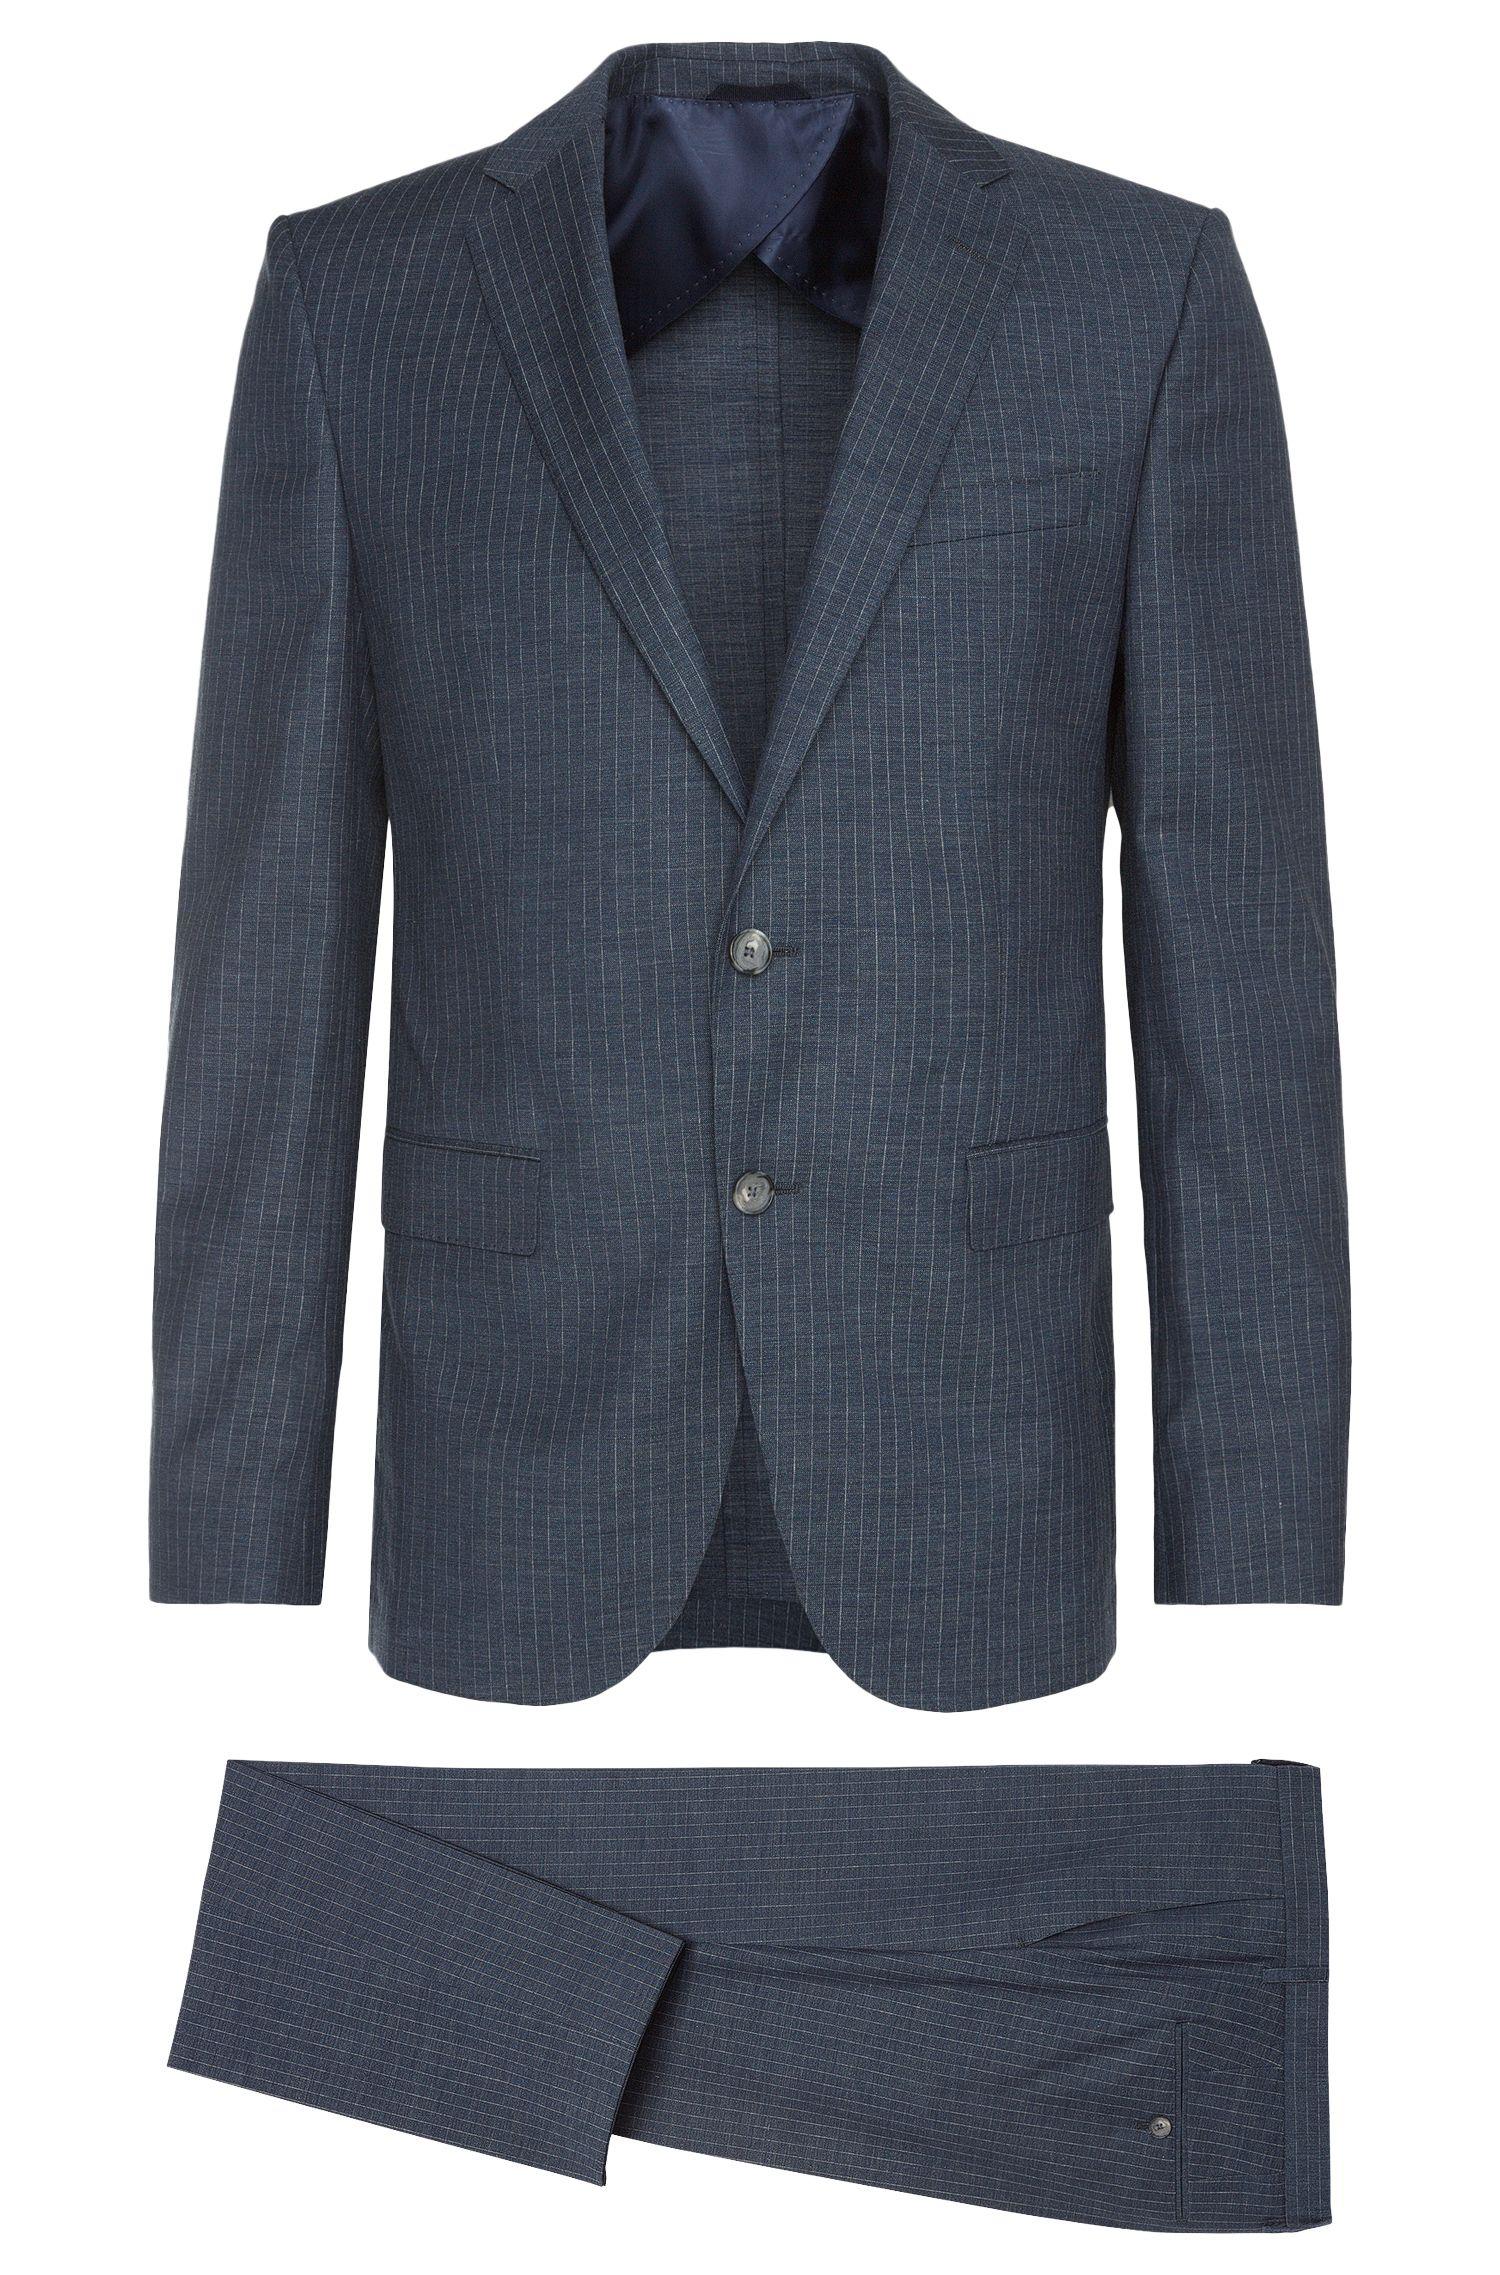 'Nortan/Benno' | Slim Fit, Virgin Wool Cotton Pinstripe Suit